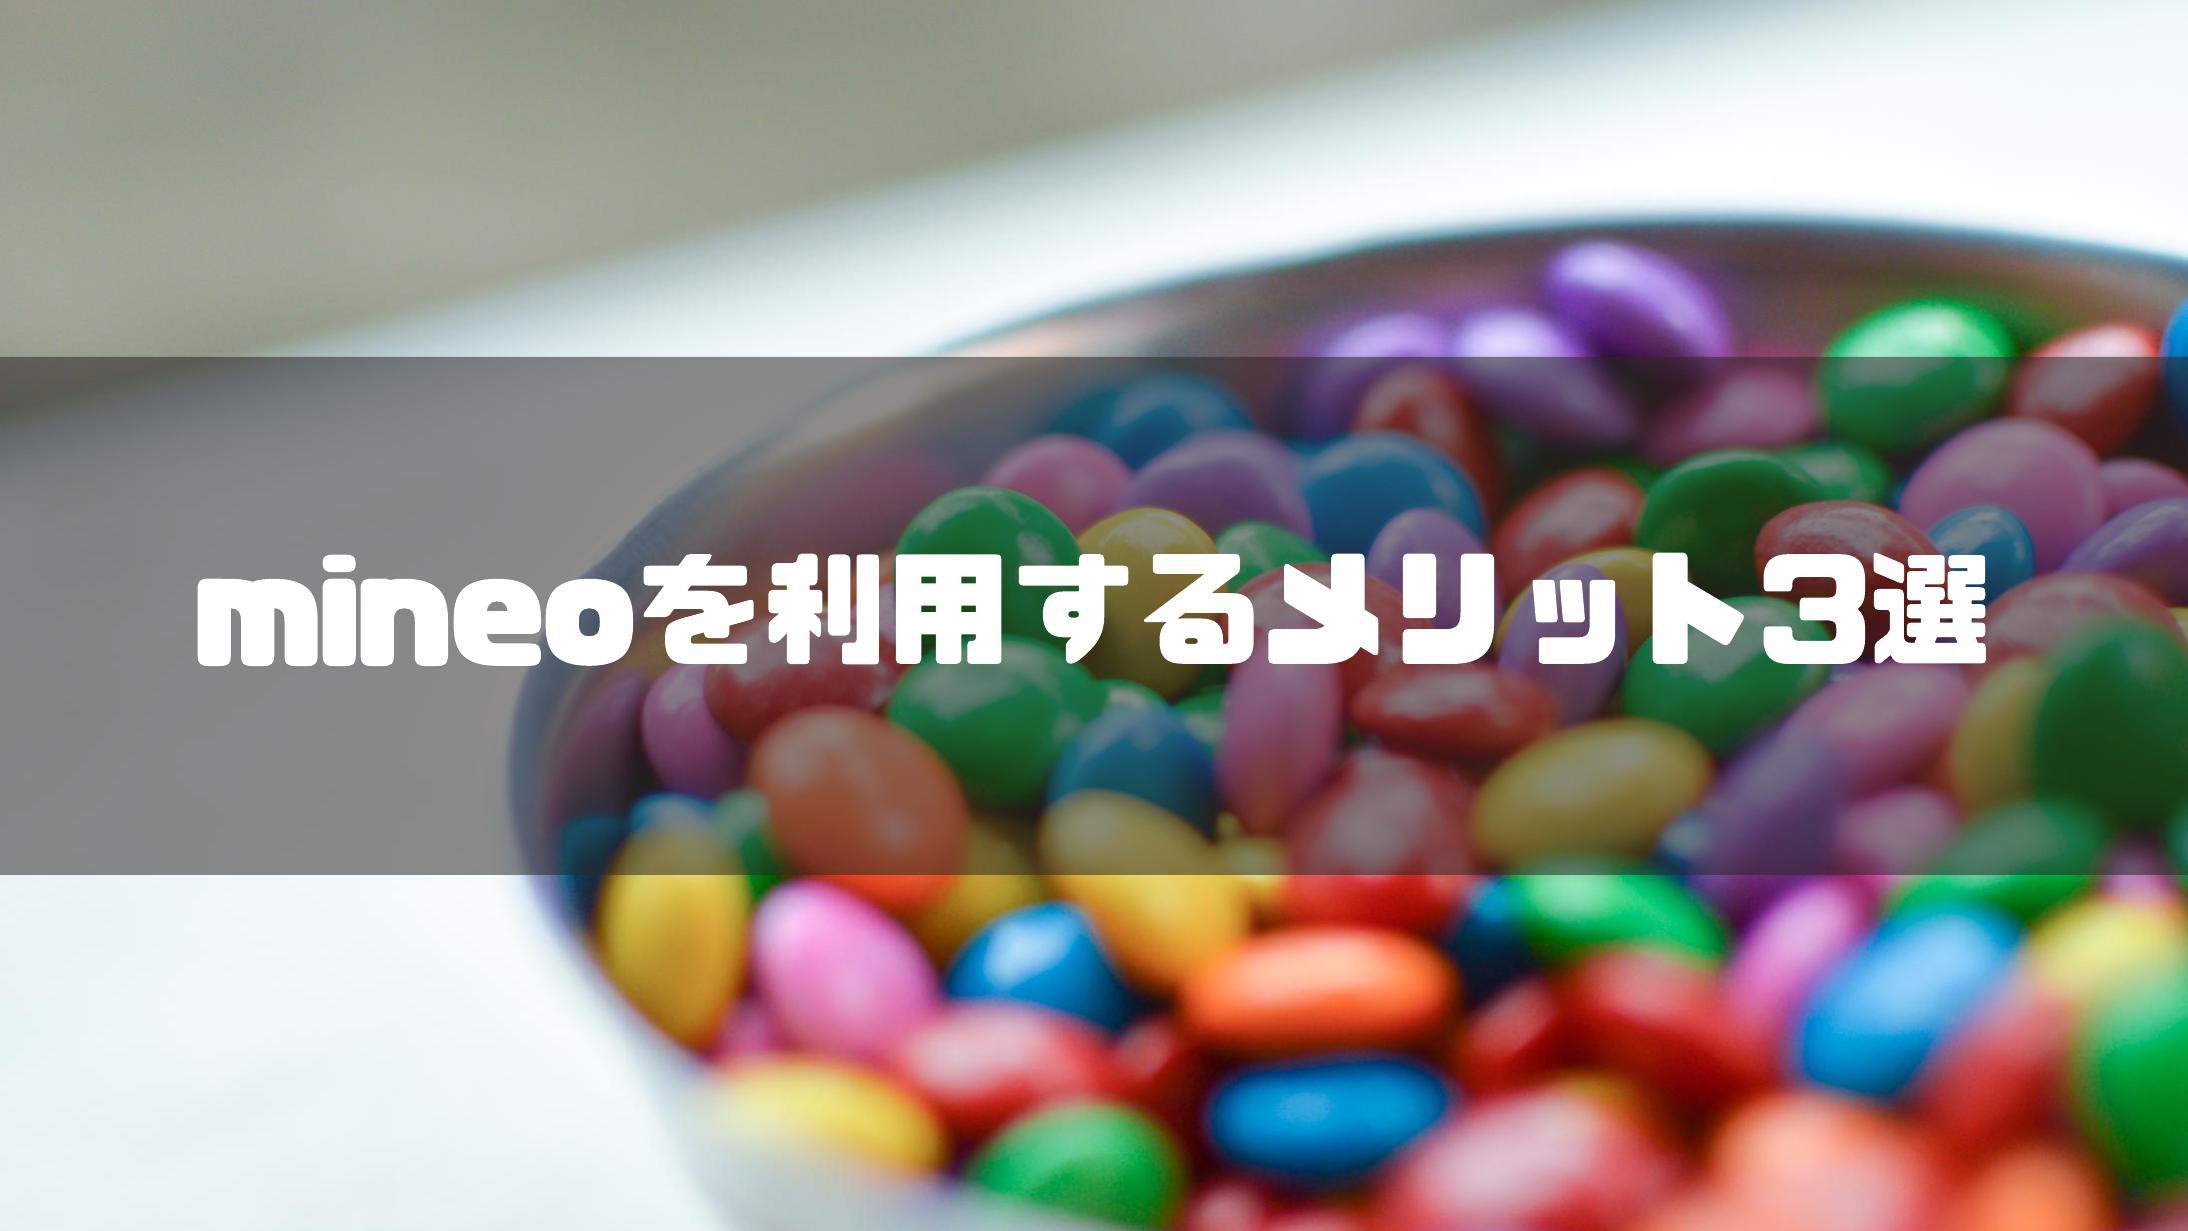 mineo_マイネオ_評価_口コミ_メリット